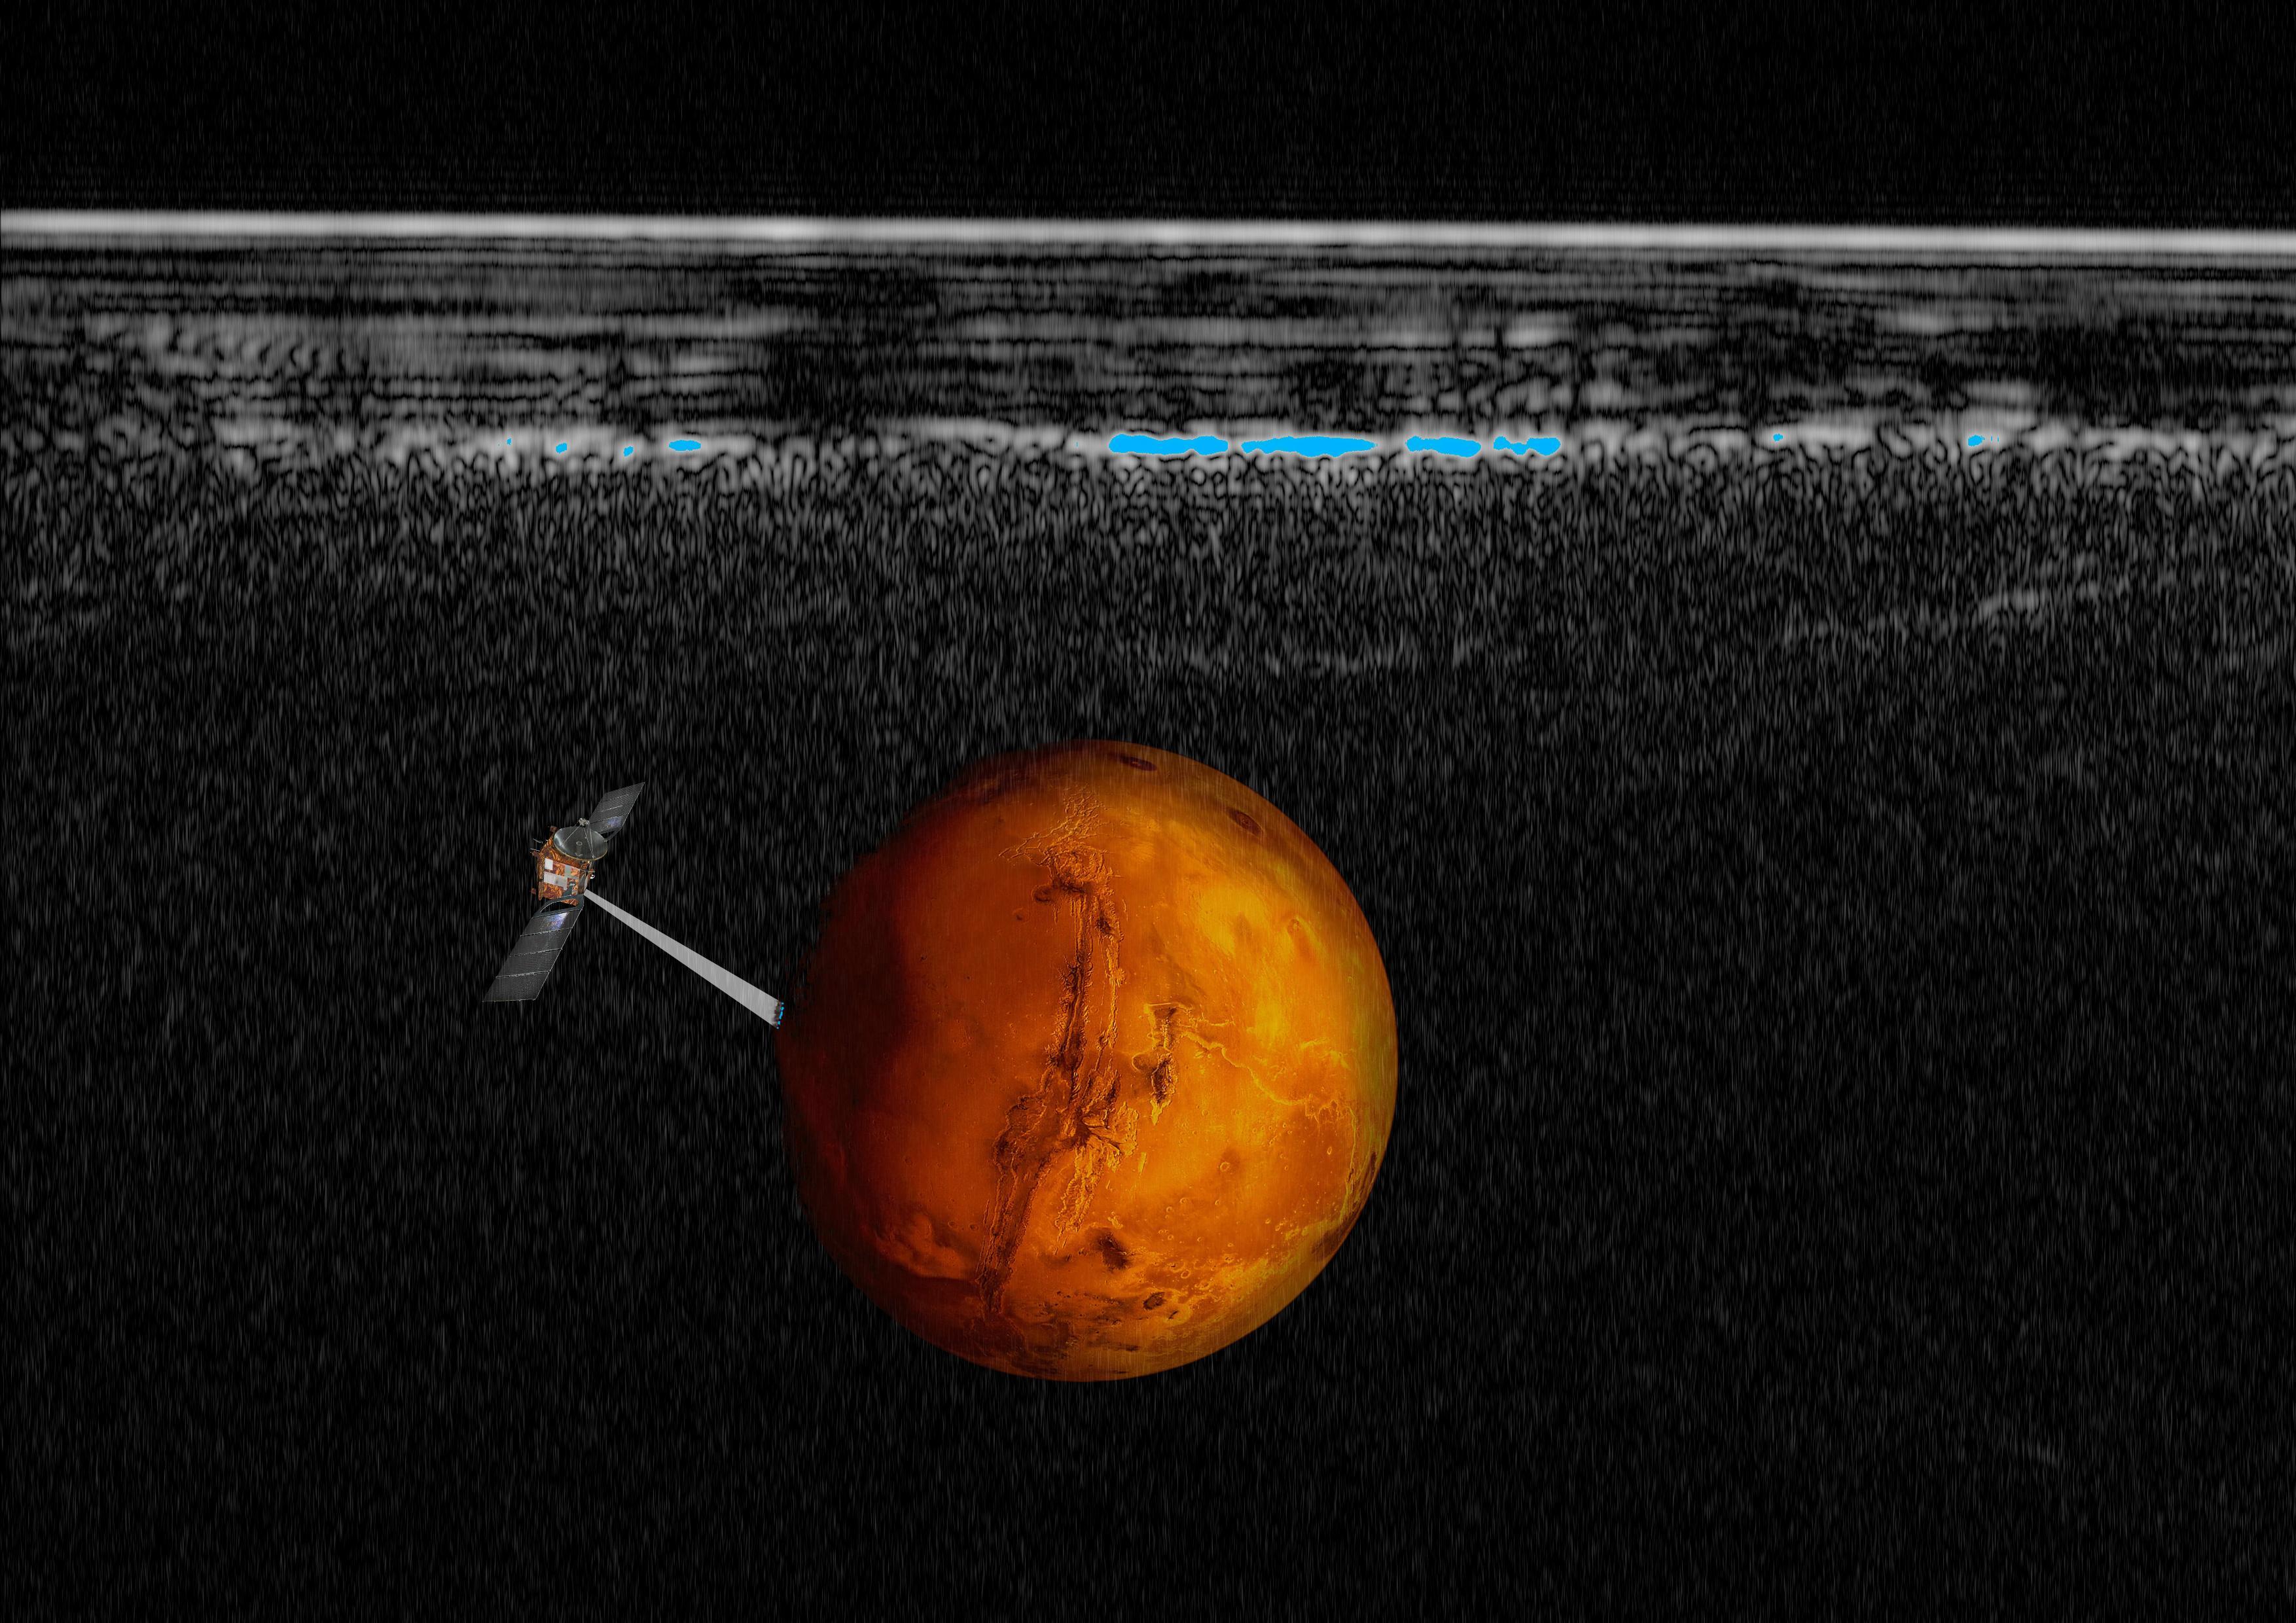 Mars: huge underground lake raises prospects of life on planet, astronomers say